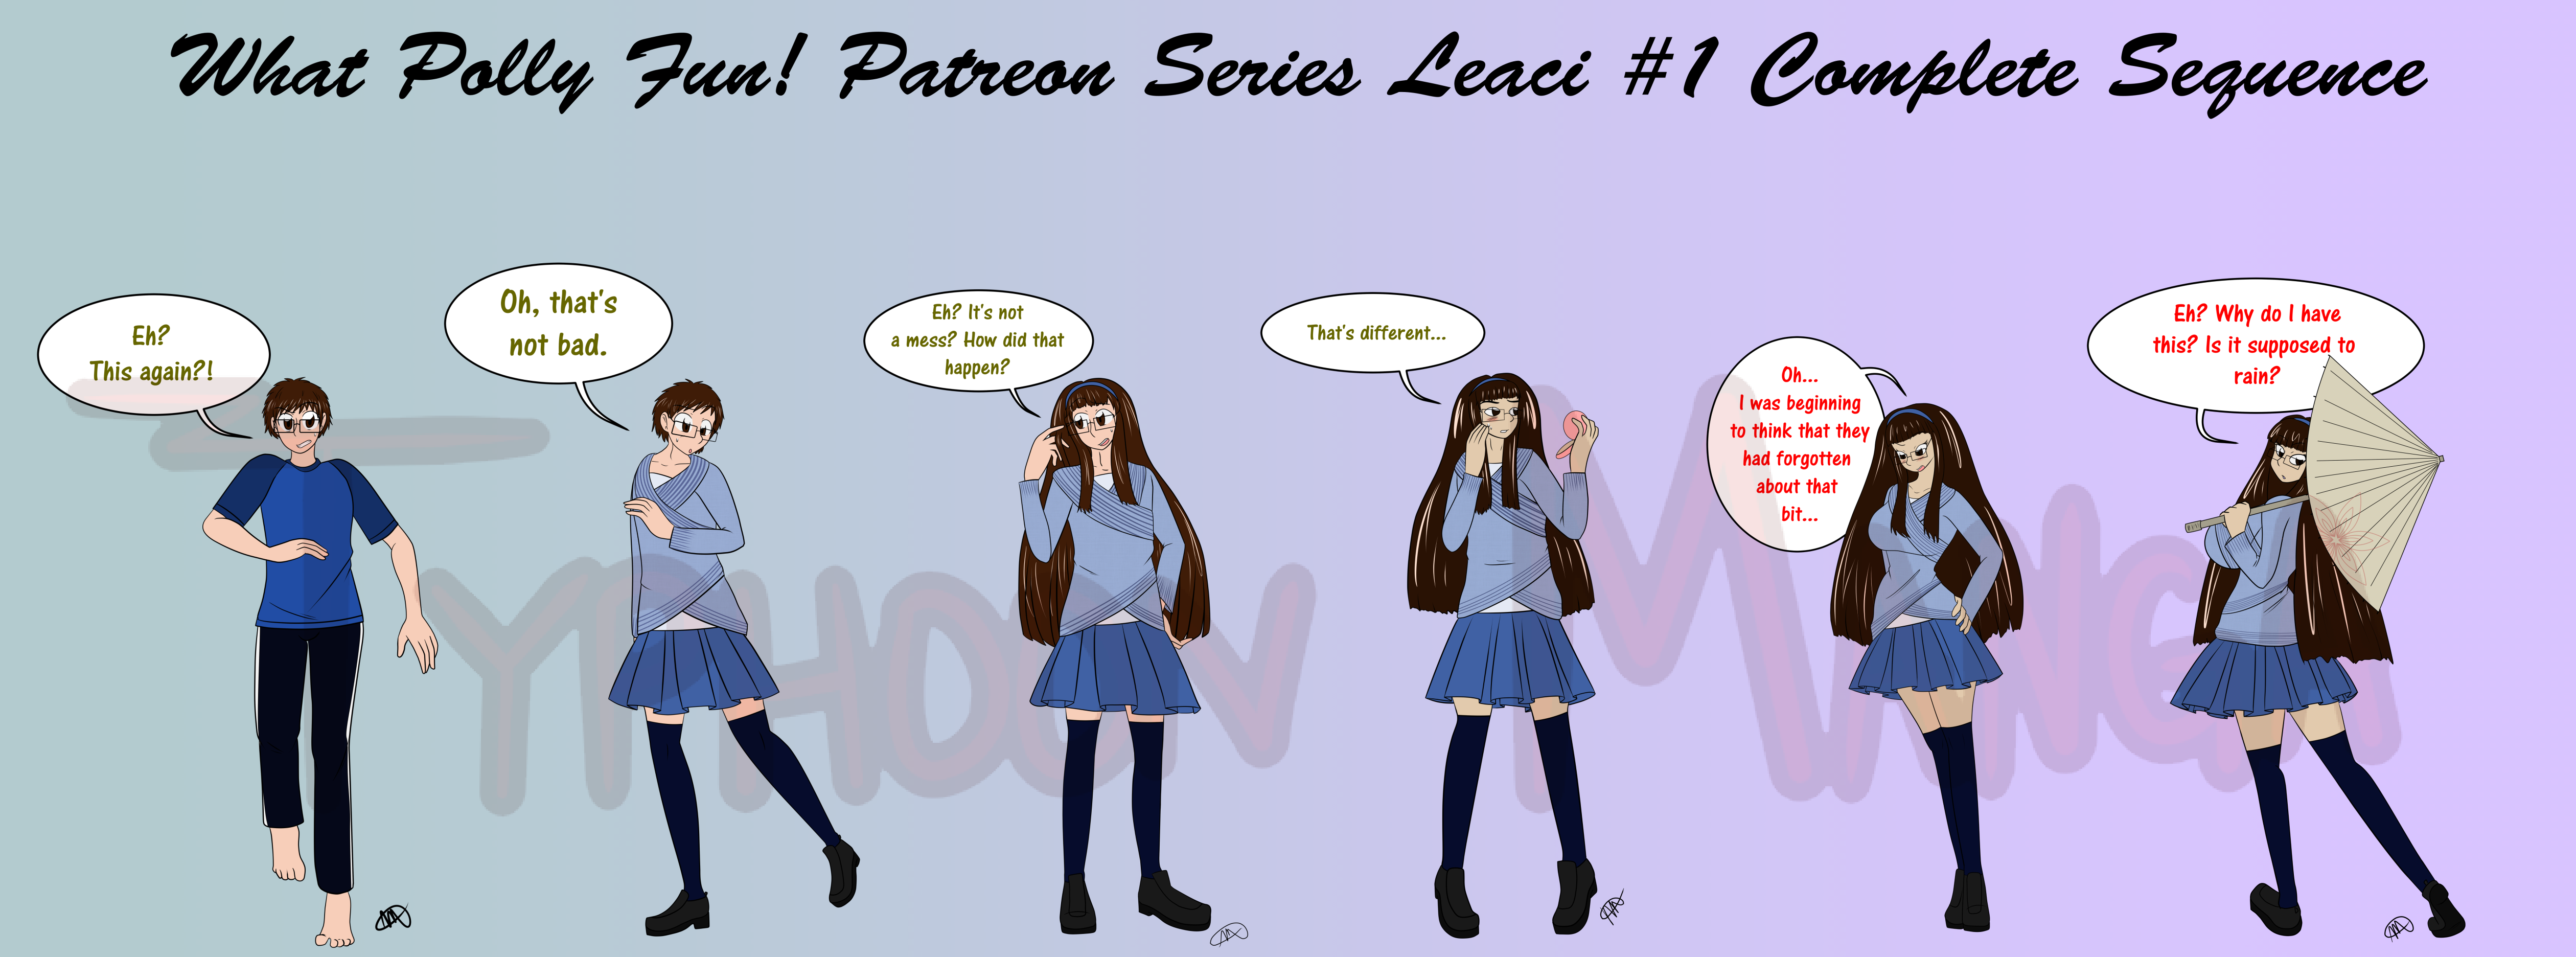 Leaci's WPF Patreon Series Complete SEQ #1 by Typhoon-Manga